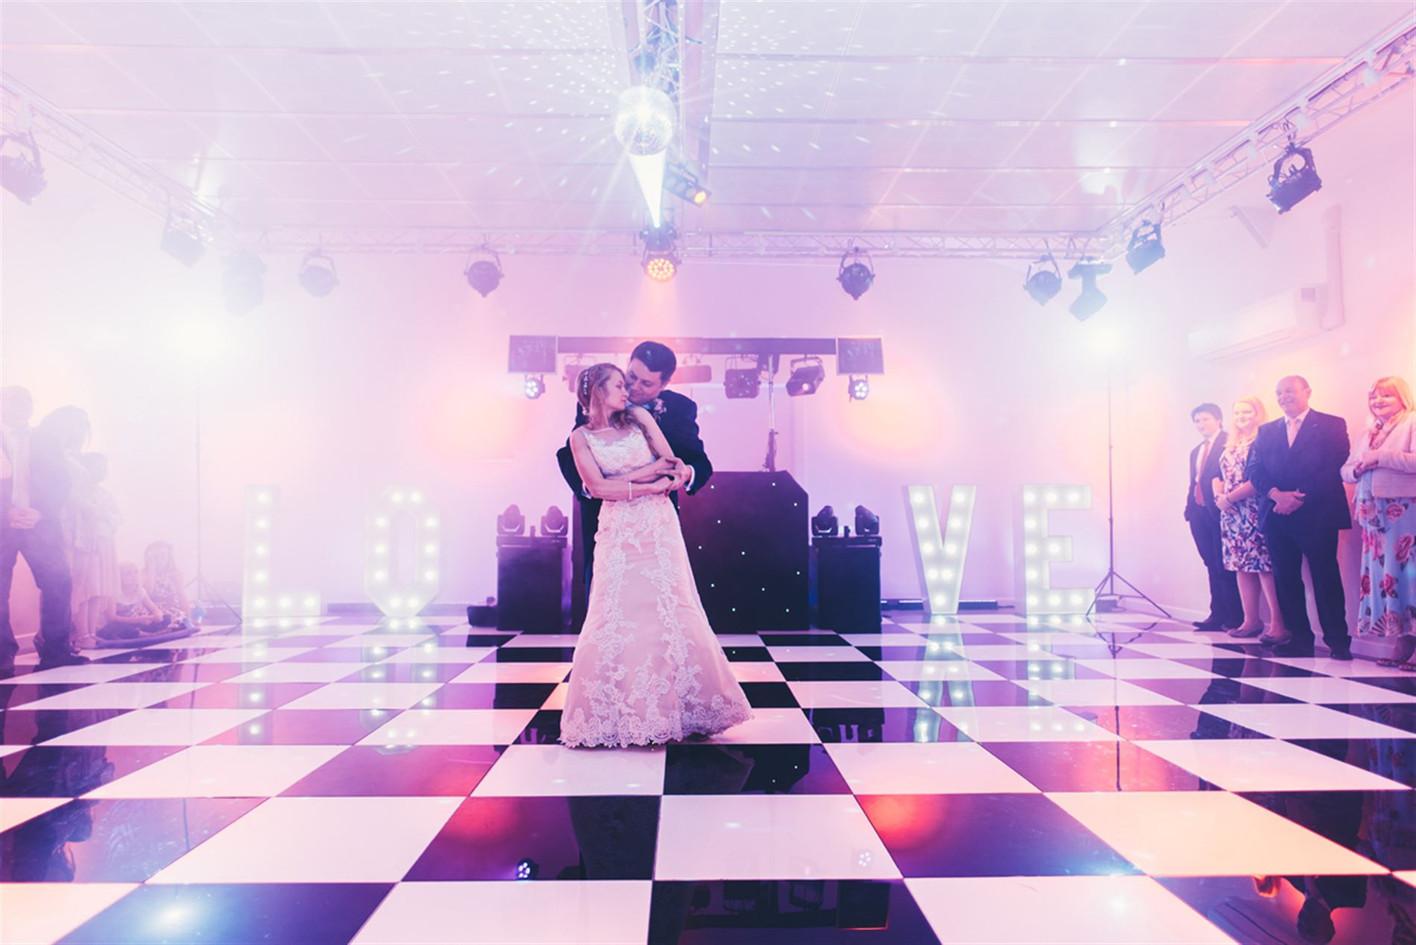 scott-and-lucy-wedding-thursford-by-james-powell-wedding-photographer-norfolk-and-suffolk-022_big.jpg